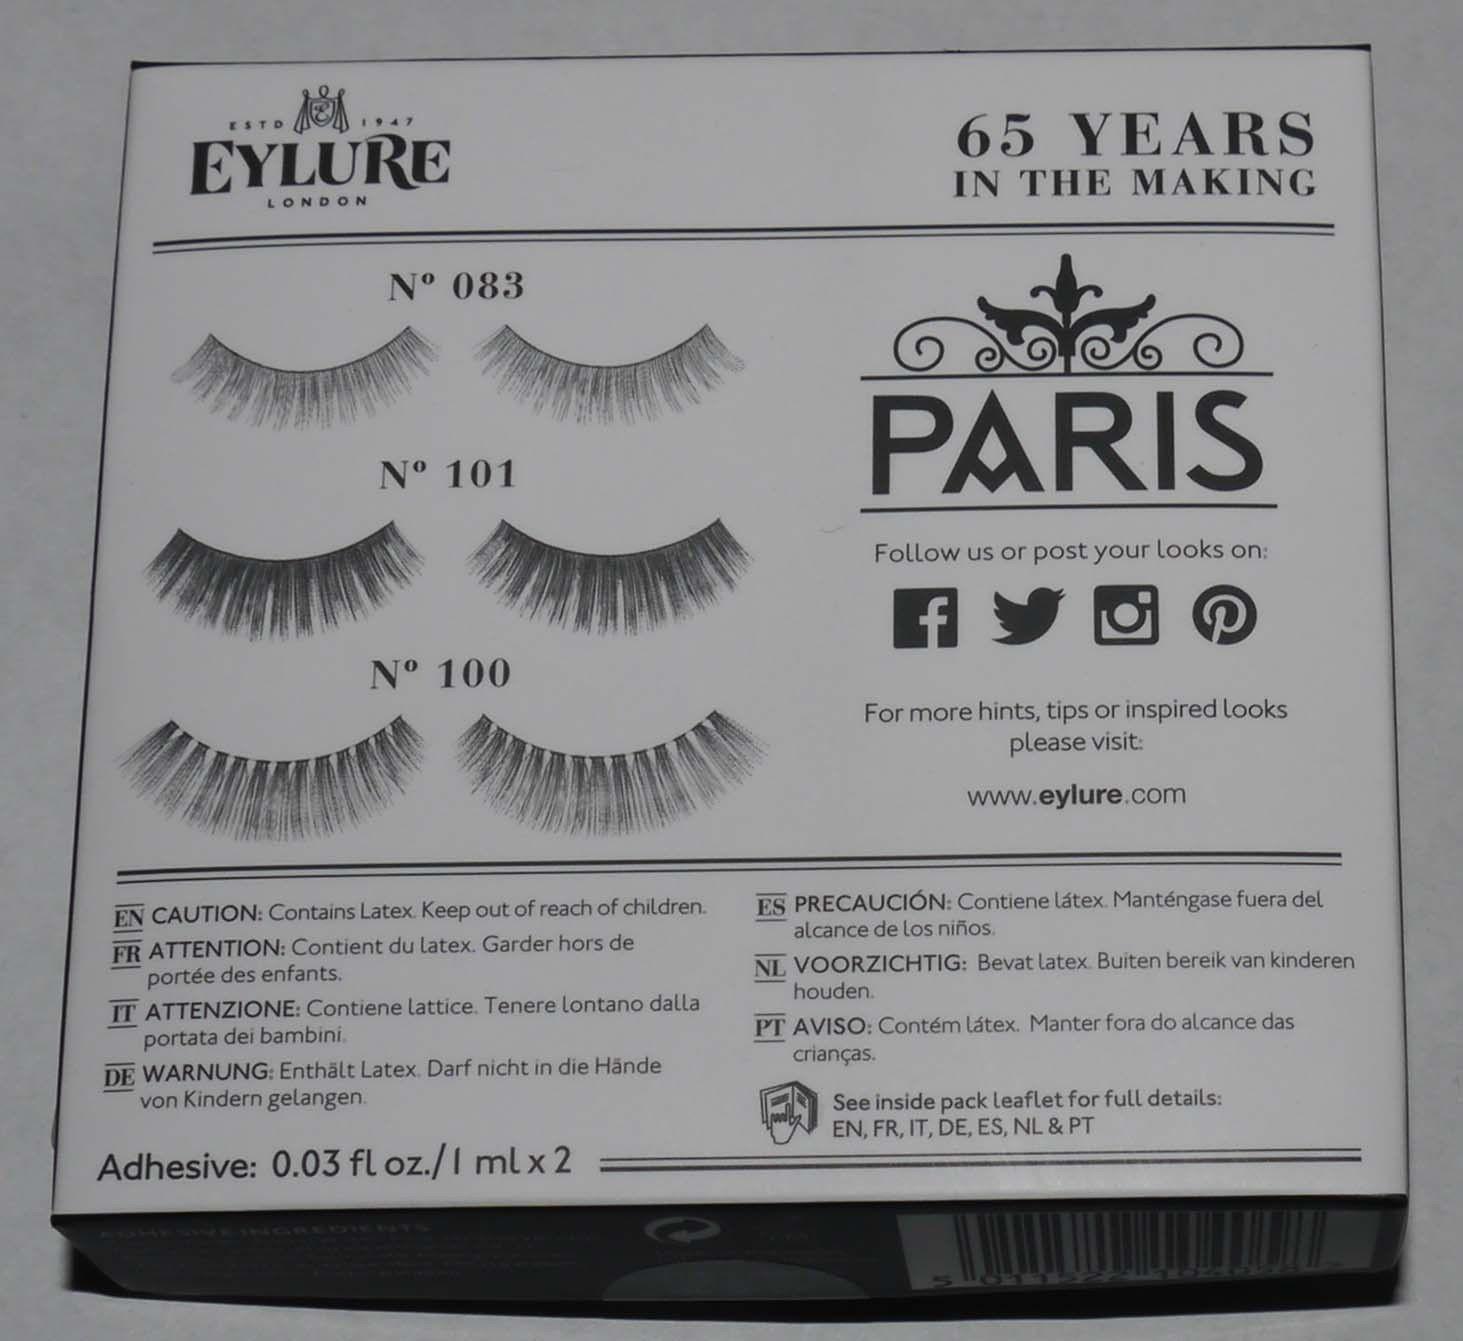 Eylure London Set of 3 The Lash Edit - Paris Re-Usable False Eye Lashes